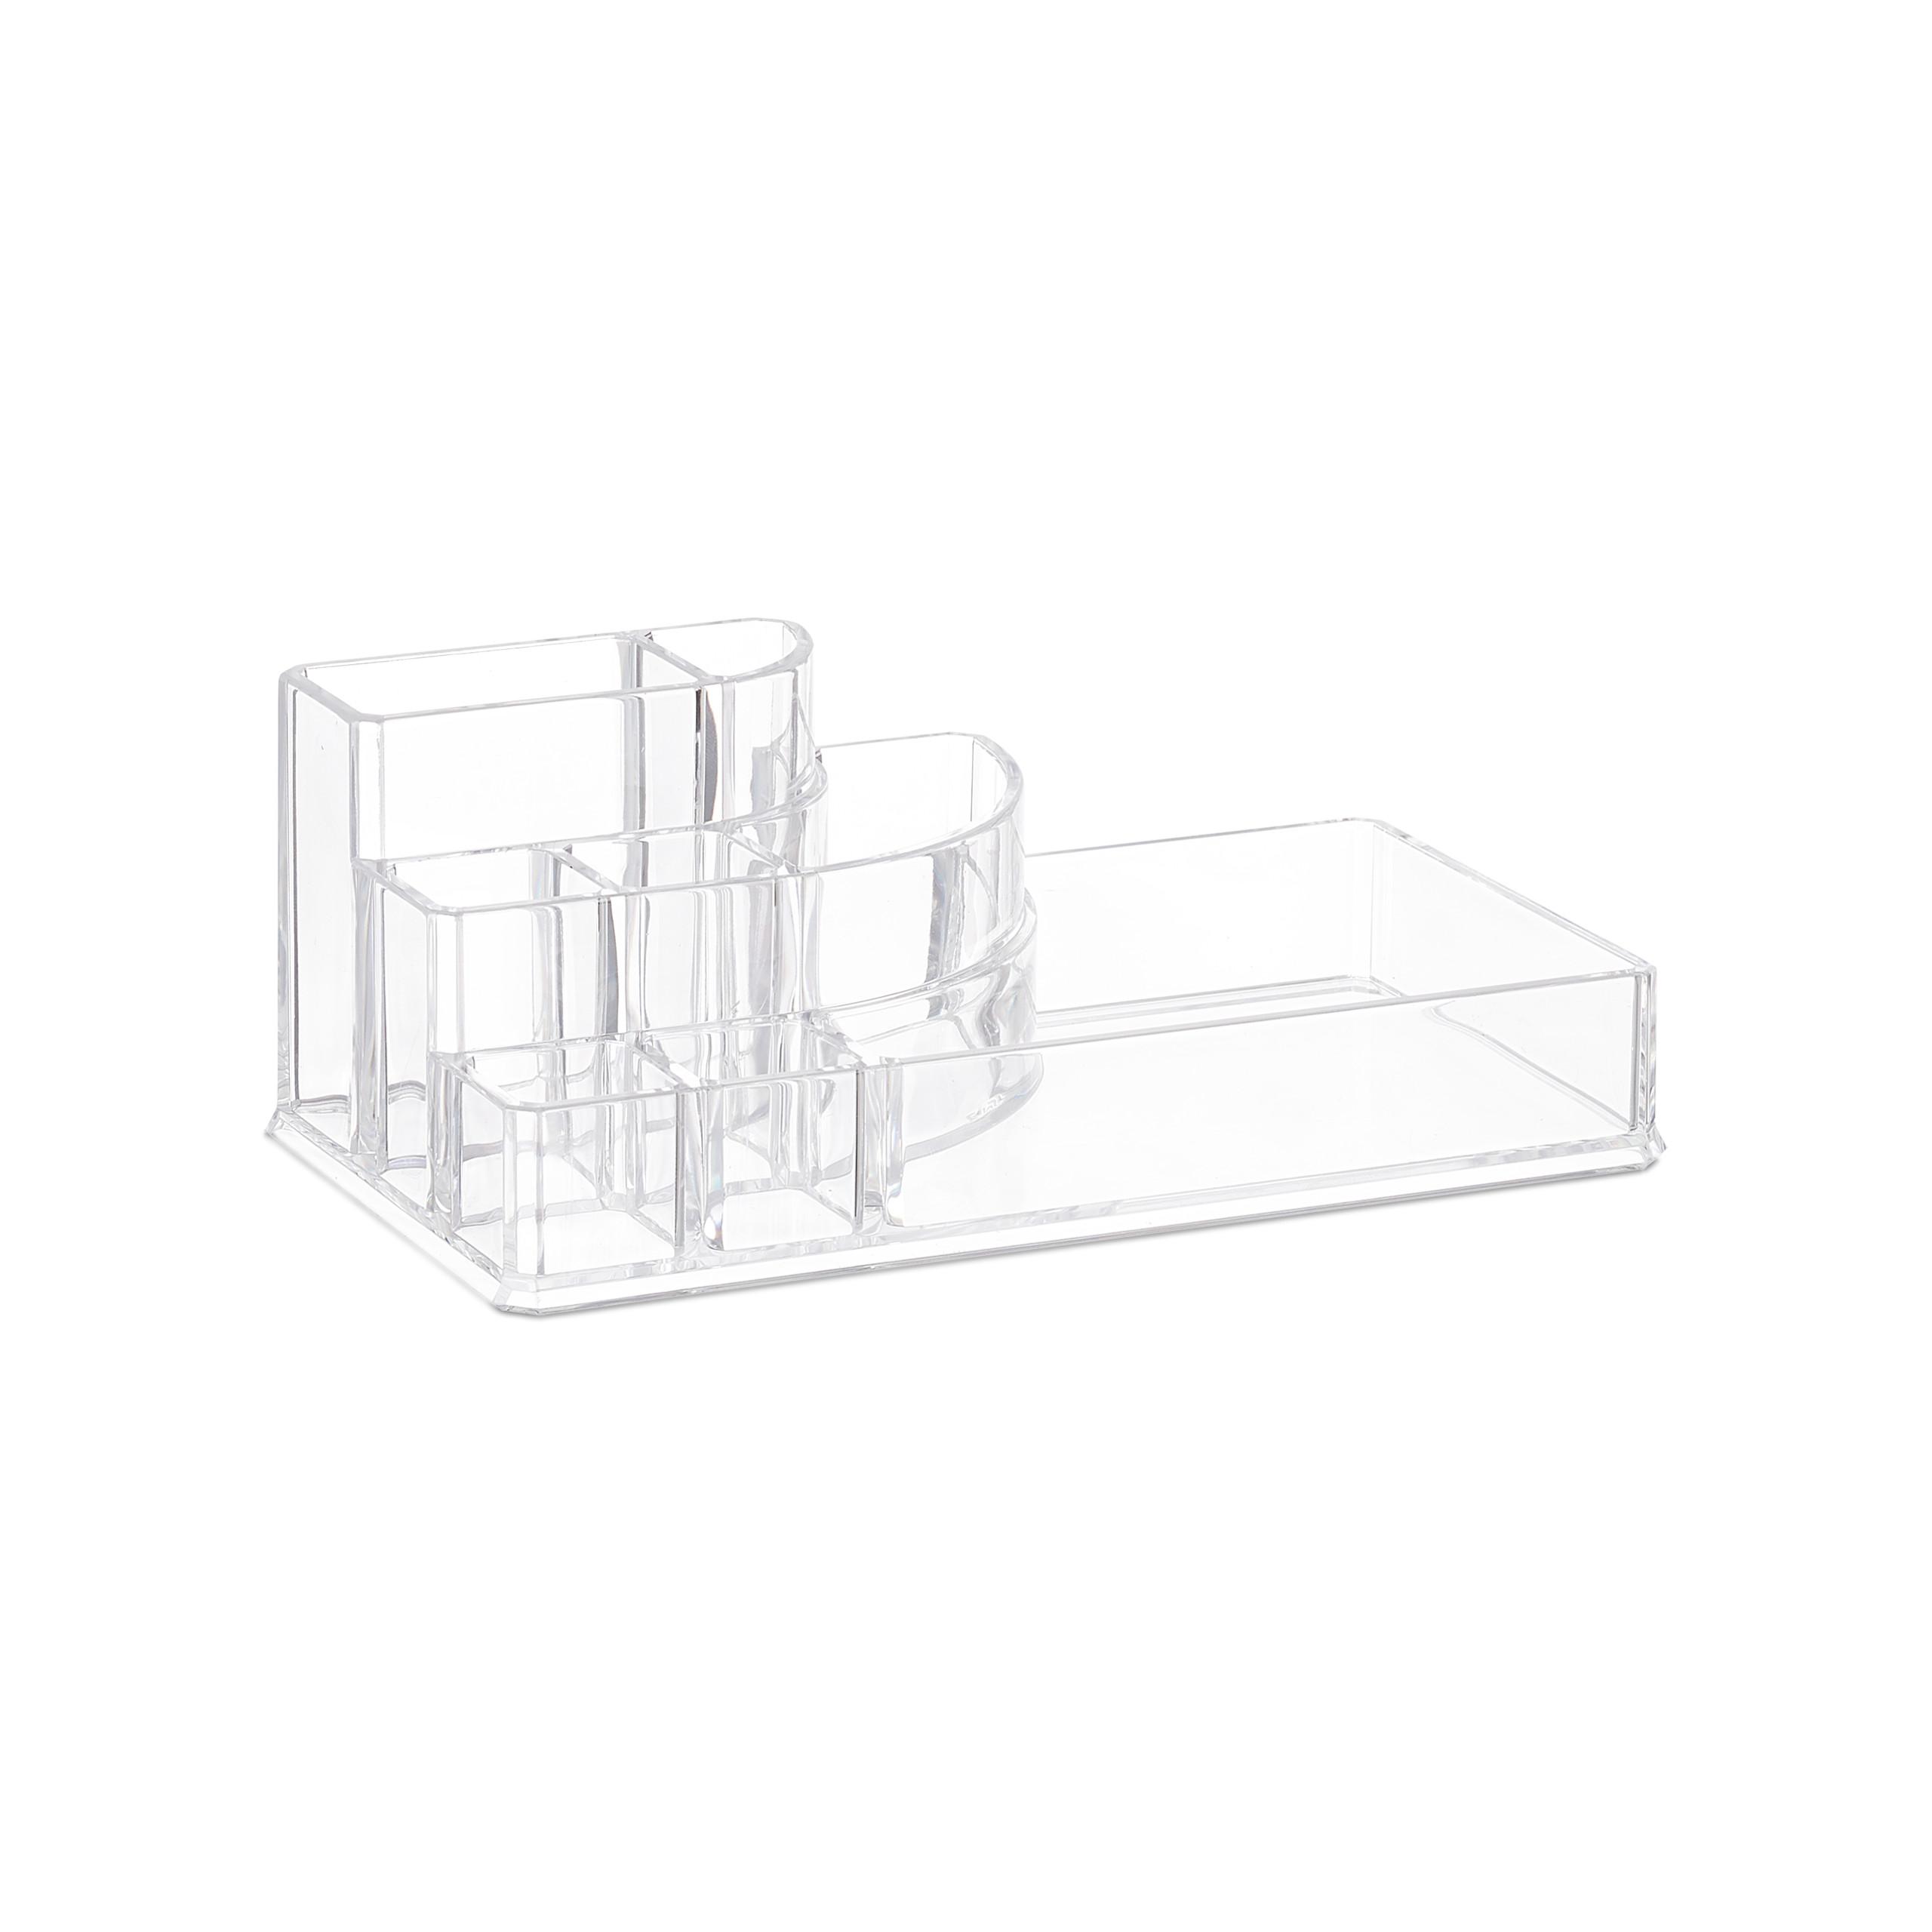 make-up-organizer-acryl-8-vakken-lippenstifthouder-opbergsysteem miniatuur 6